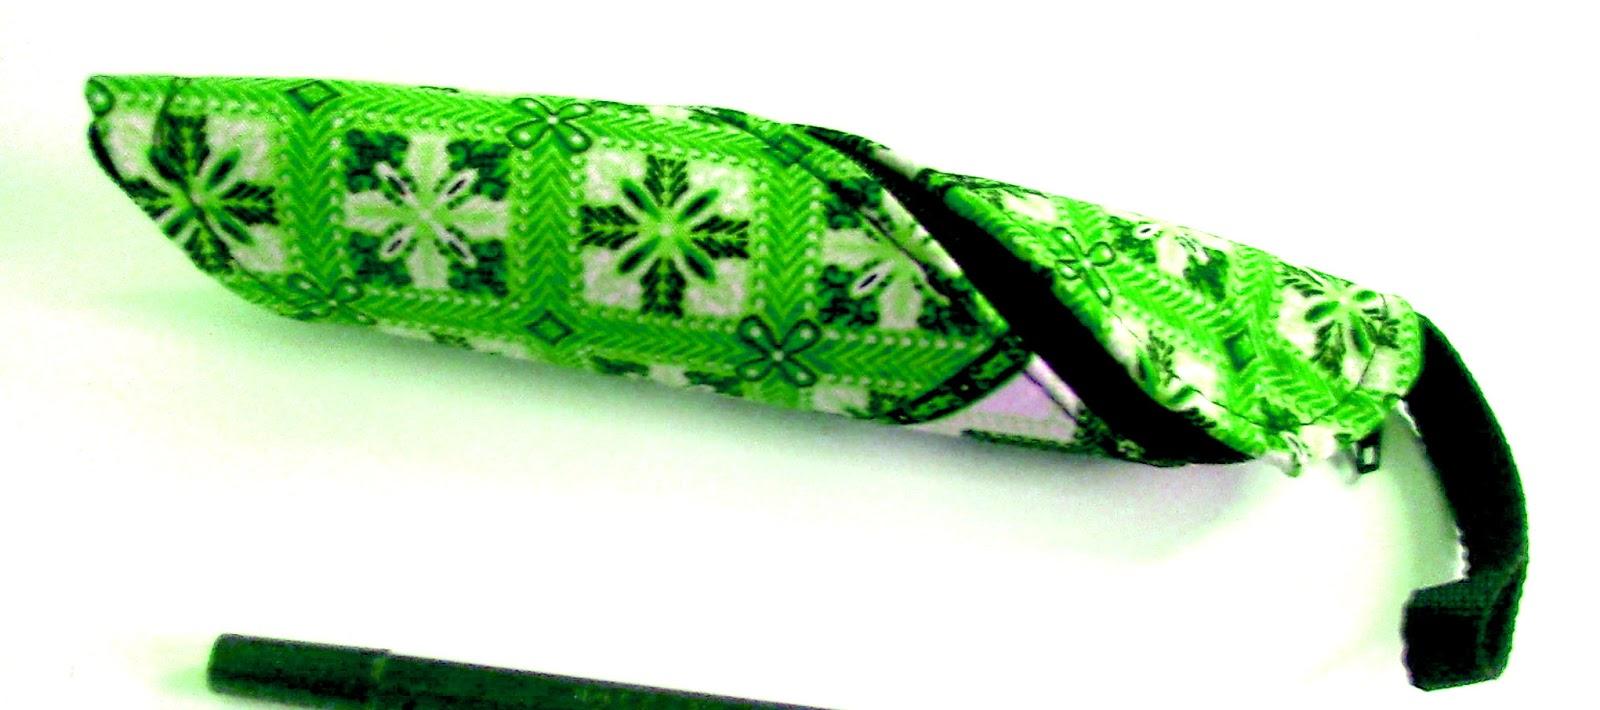 Jual Souvenir Dompet Pisang Batik